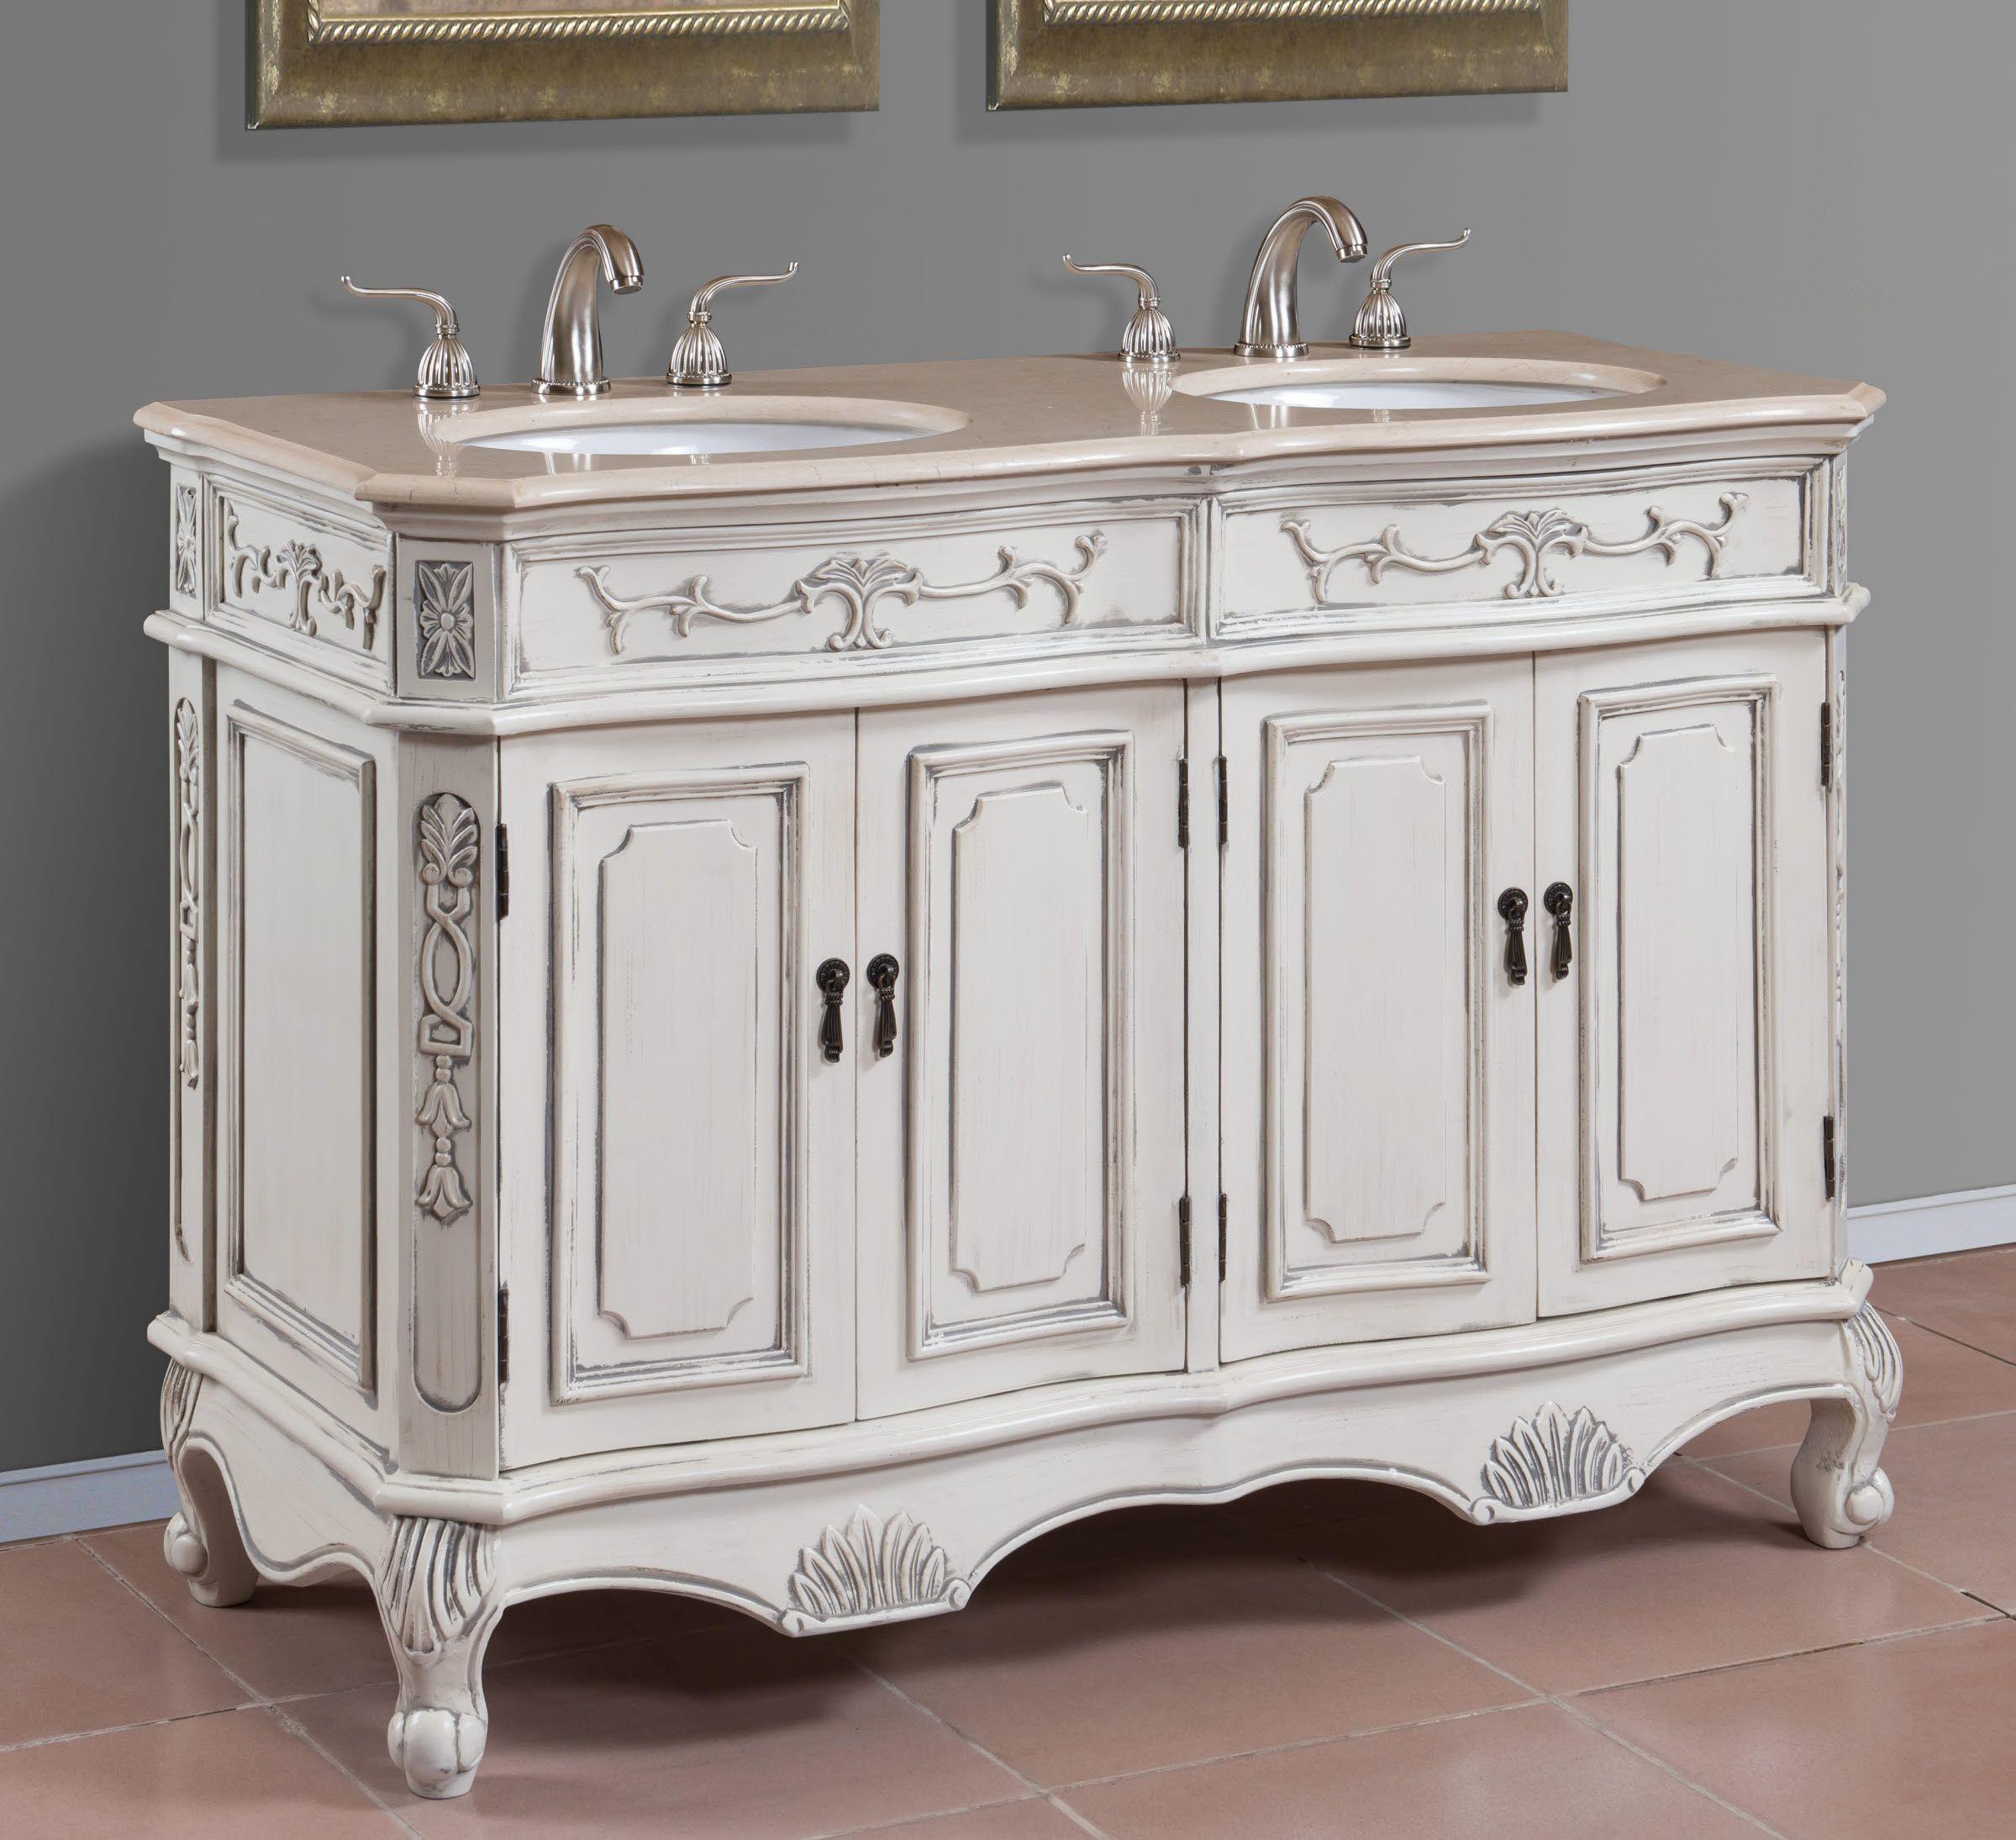 48 Inch Double Sink Bathroom Vanity Double Vanity Bathroom